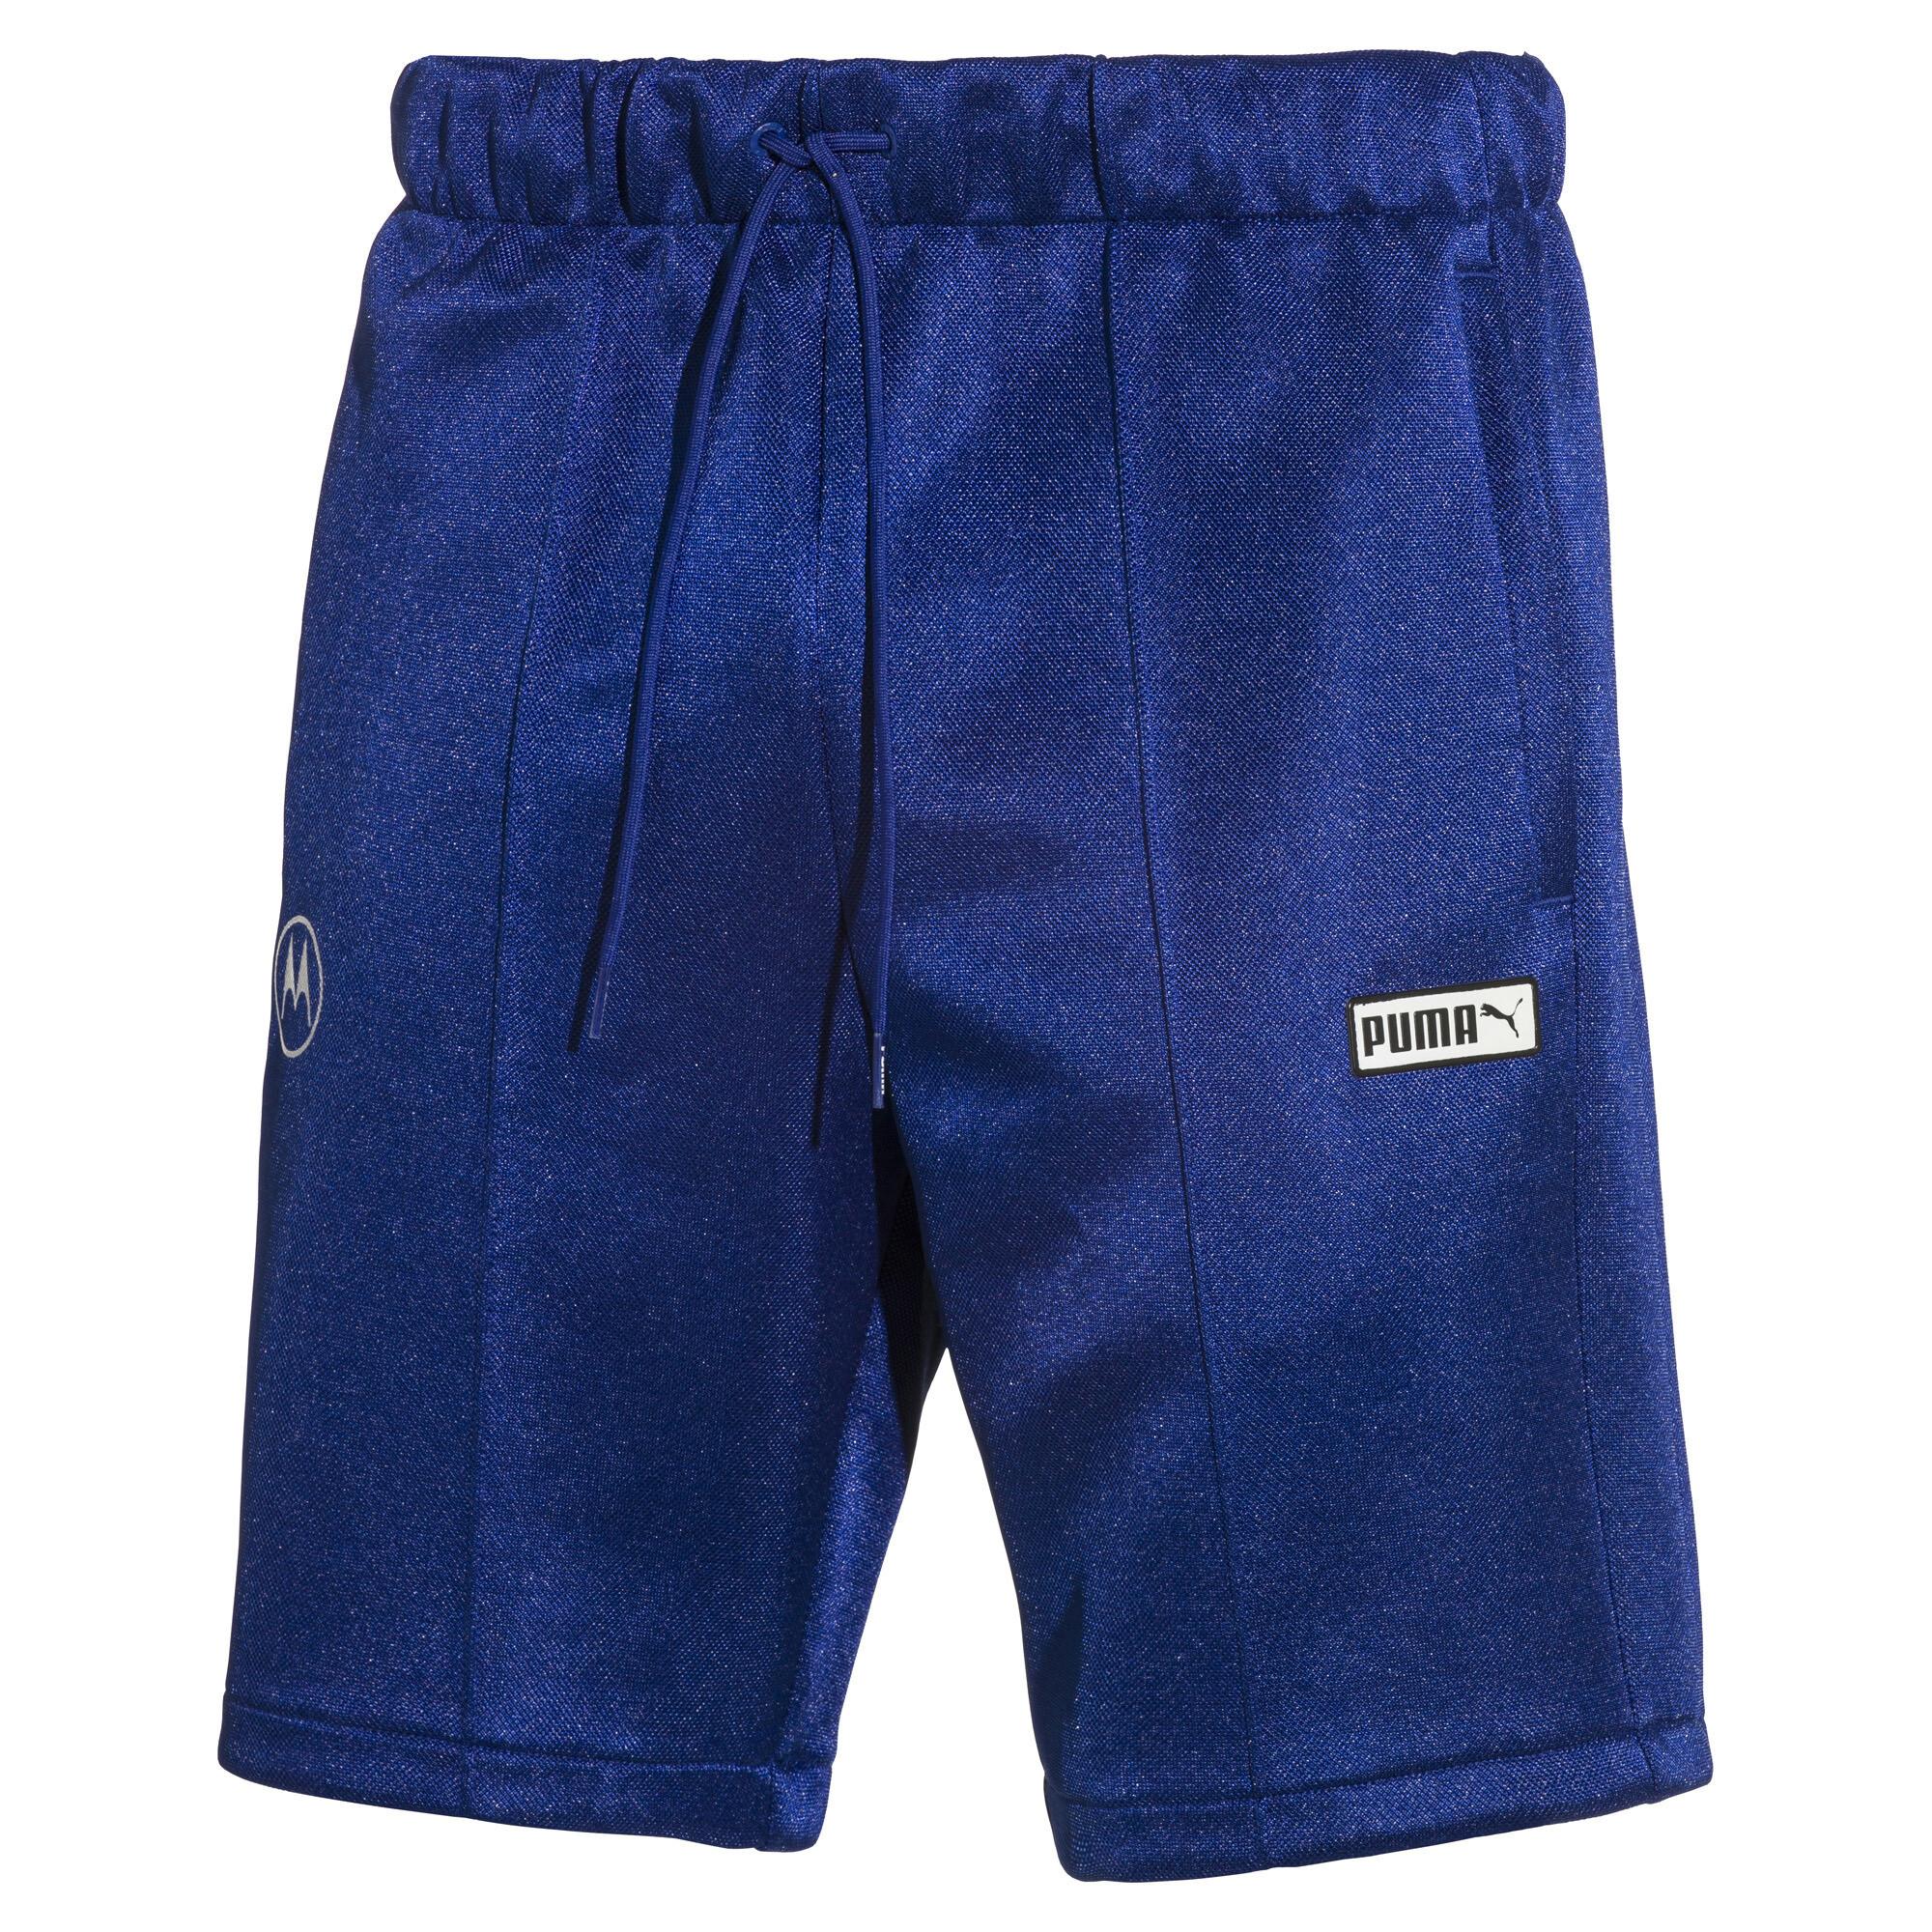 Image Puma PUMA x MOTOROLA T7 Spezial Men's Shorts #1